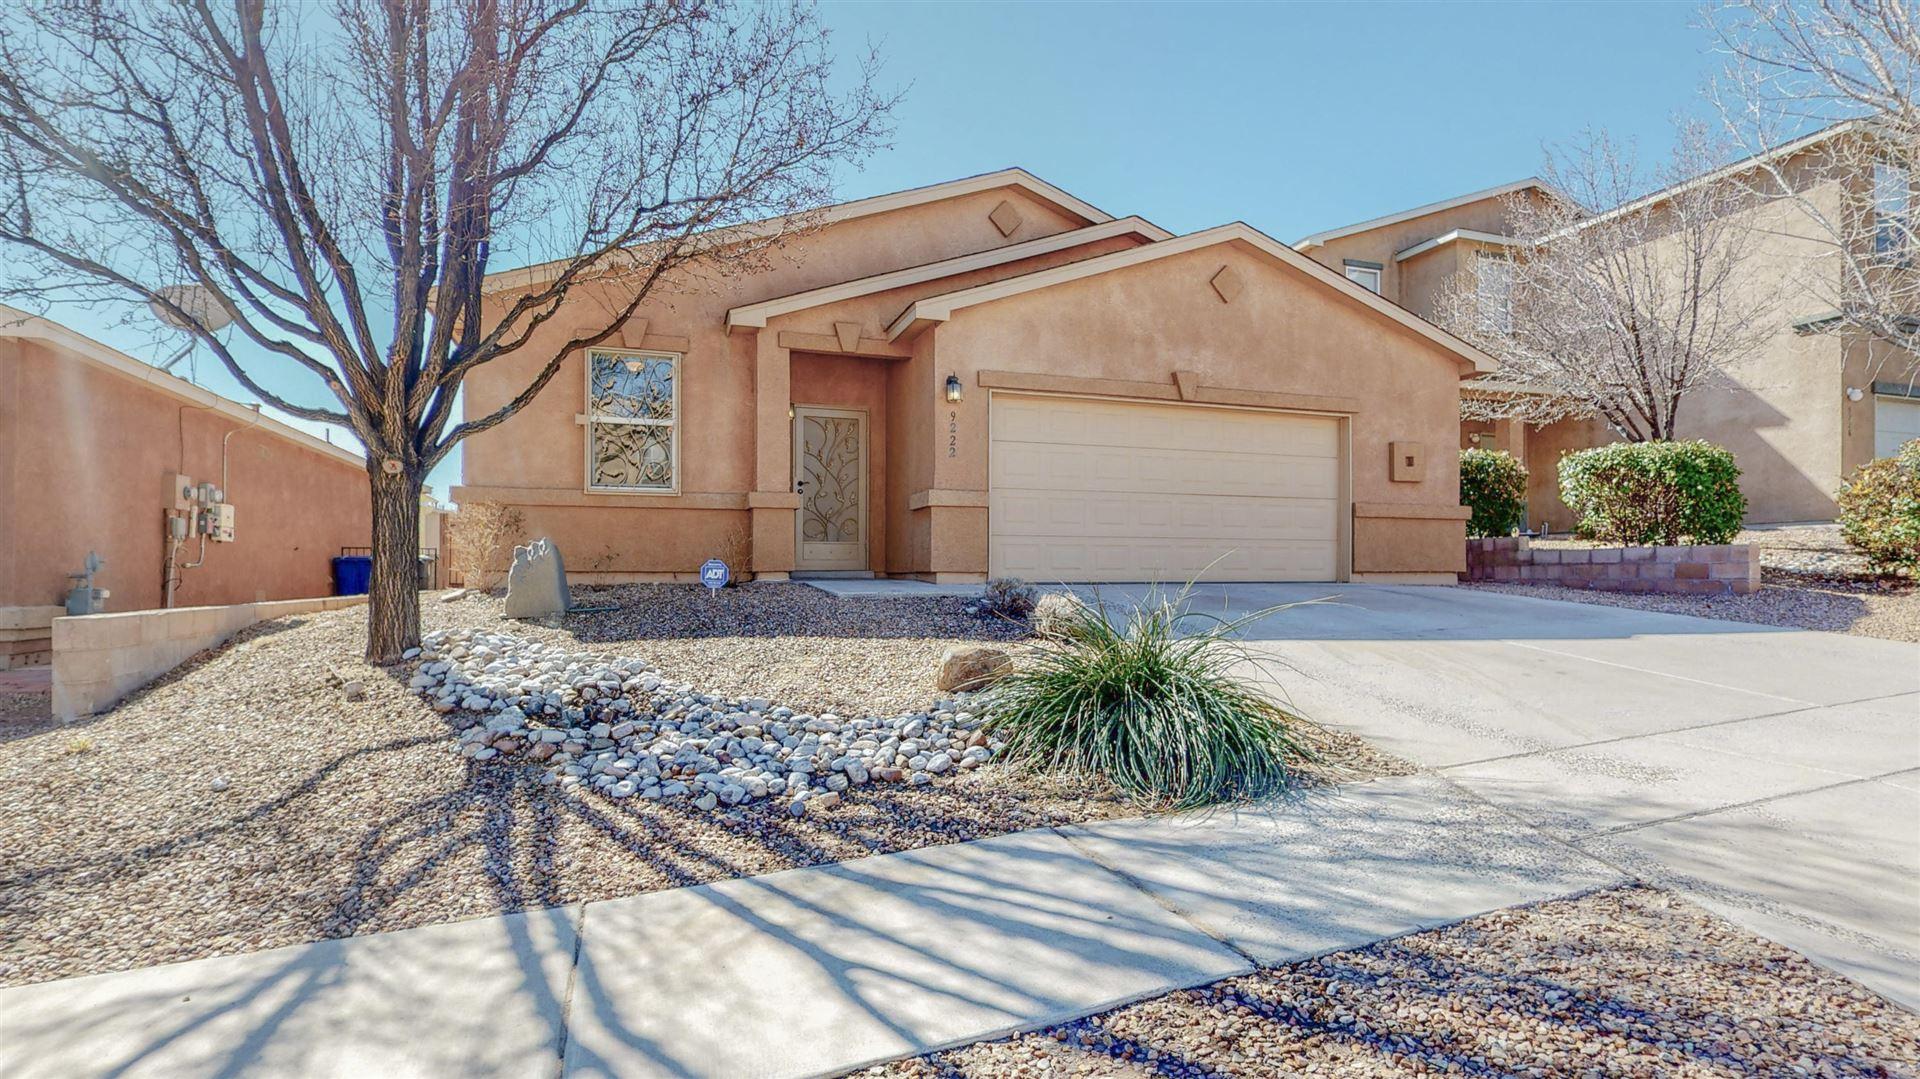 9222 RIVERBEND Avenue SW, Albuquerque, NM 87121 - MLS#: 986550